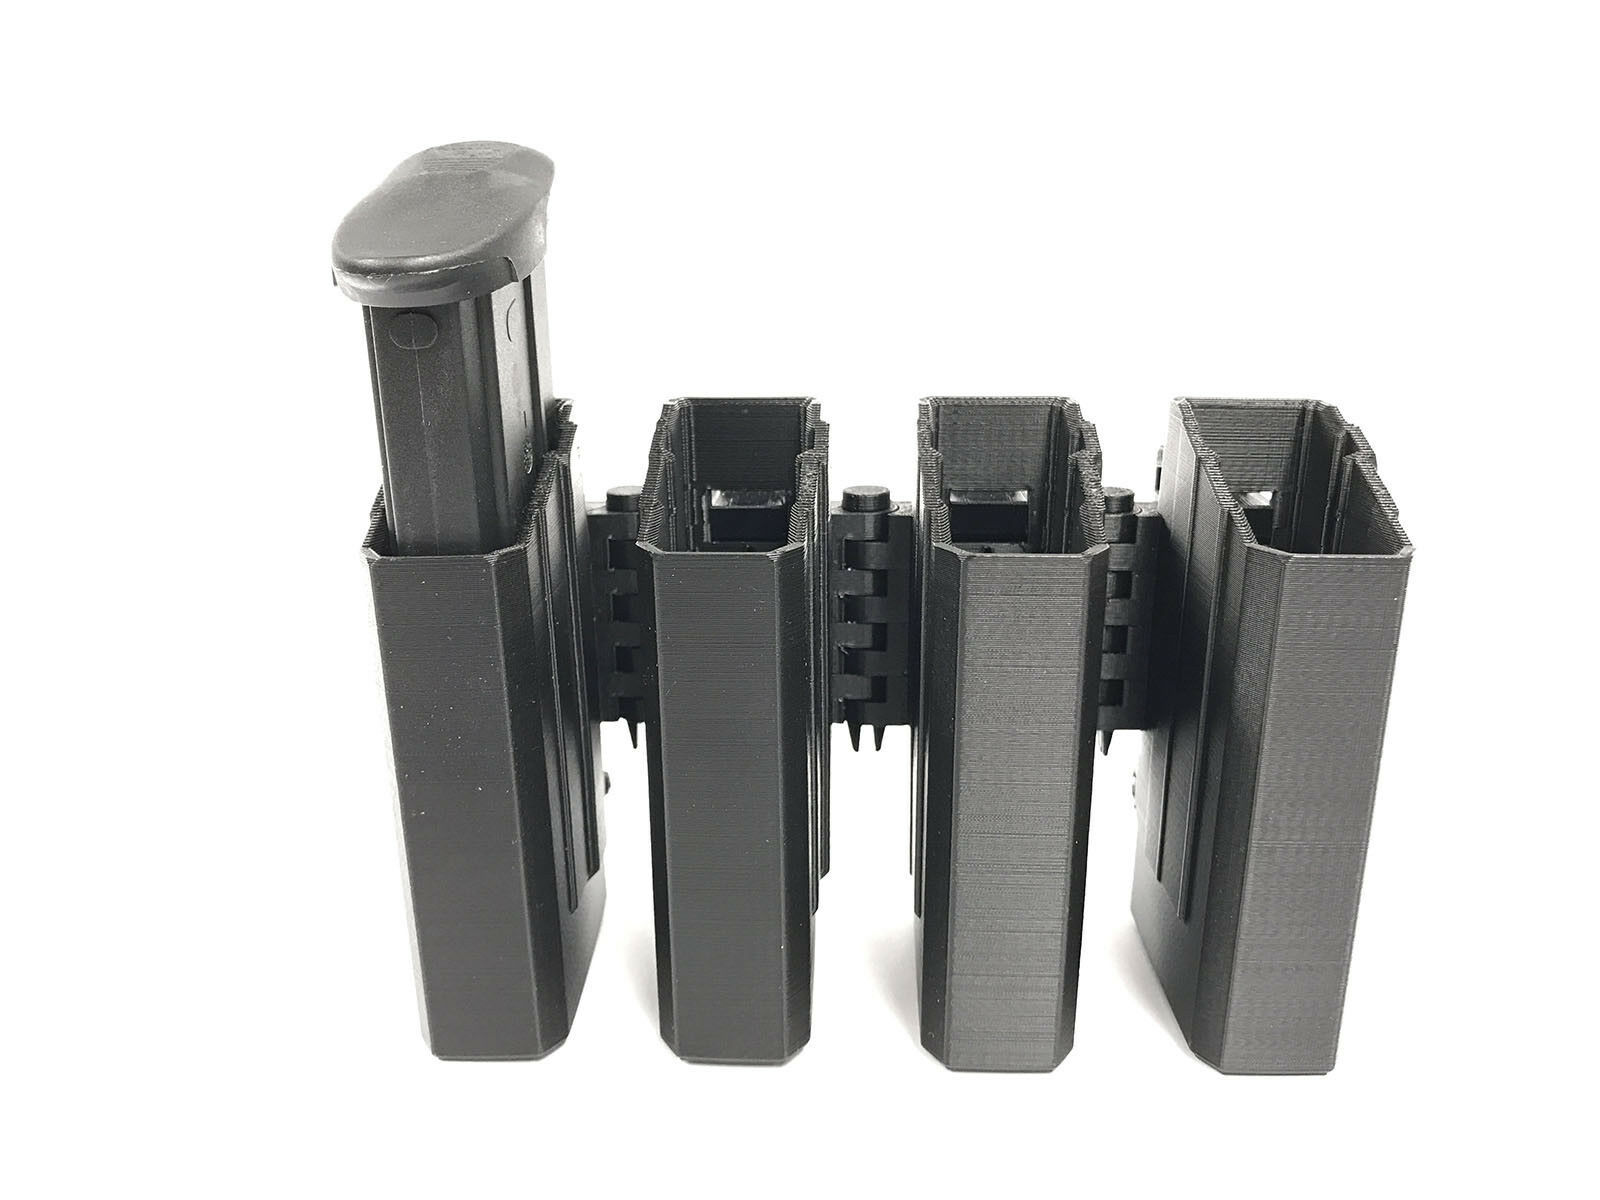 EAMP Enforcer - FN Five SeveN (5.7) Quad Mag Pouch - MagP0474-D